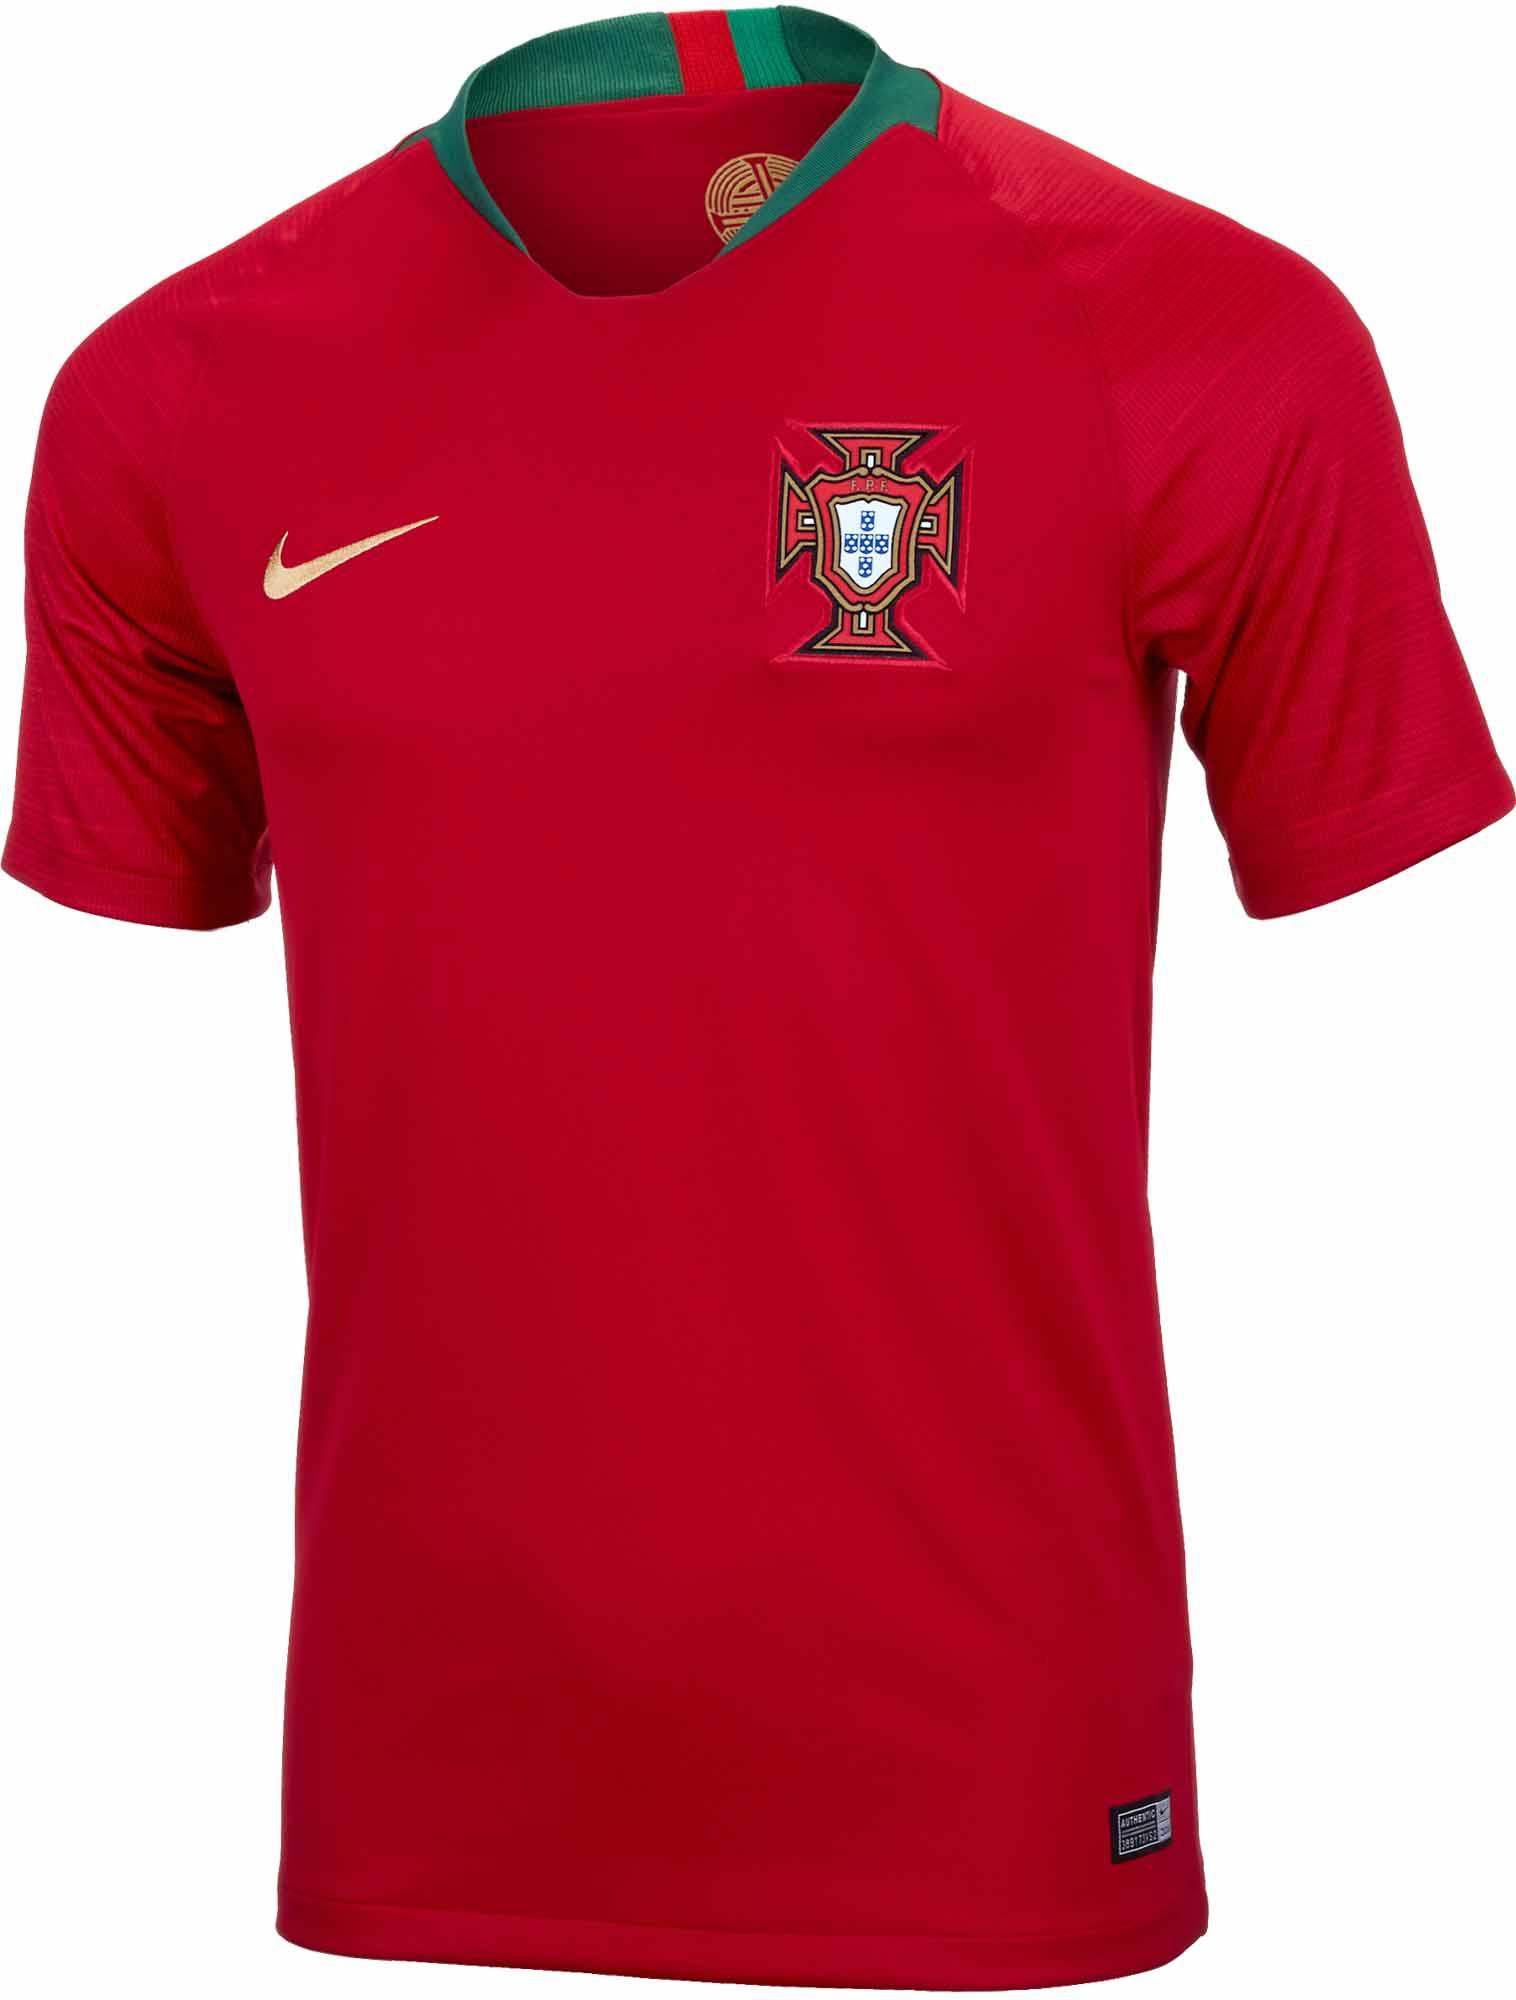 34a9037dd Nike Portugal Home Jersey 2018-19- SoccerPro.com